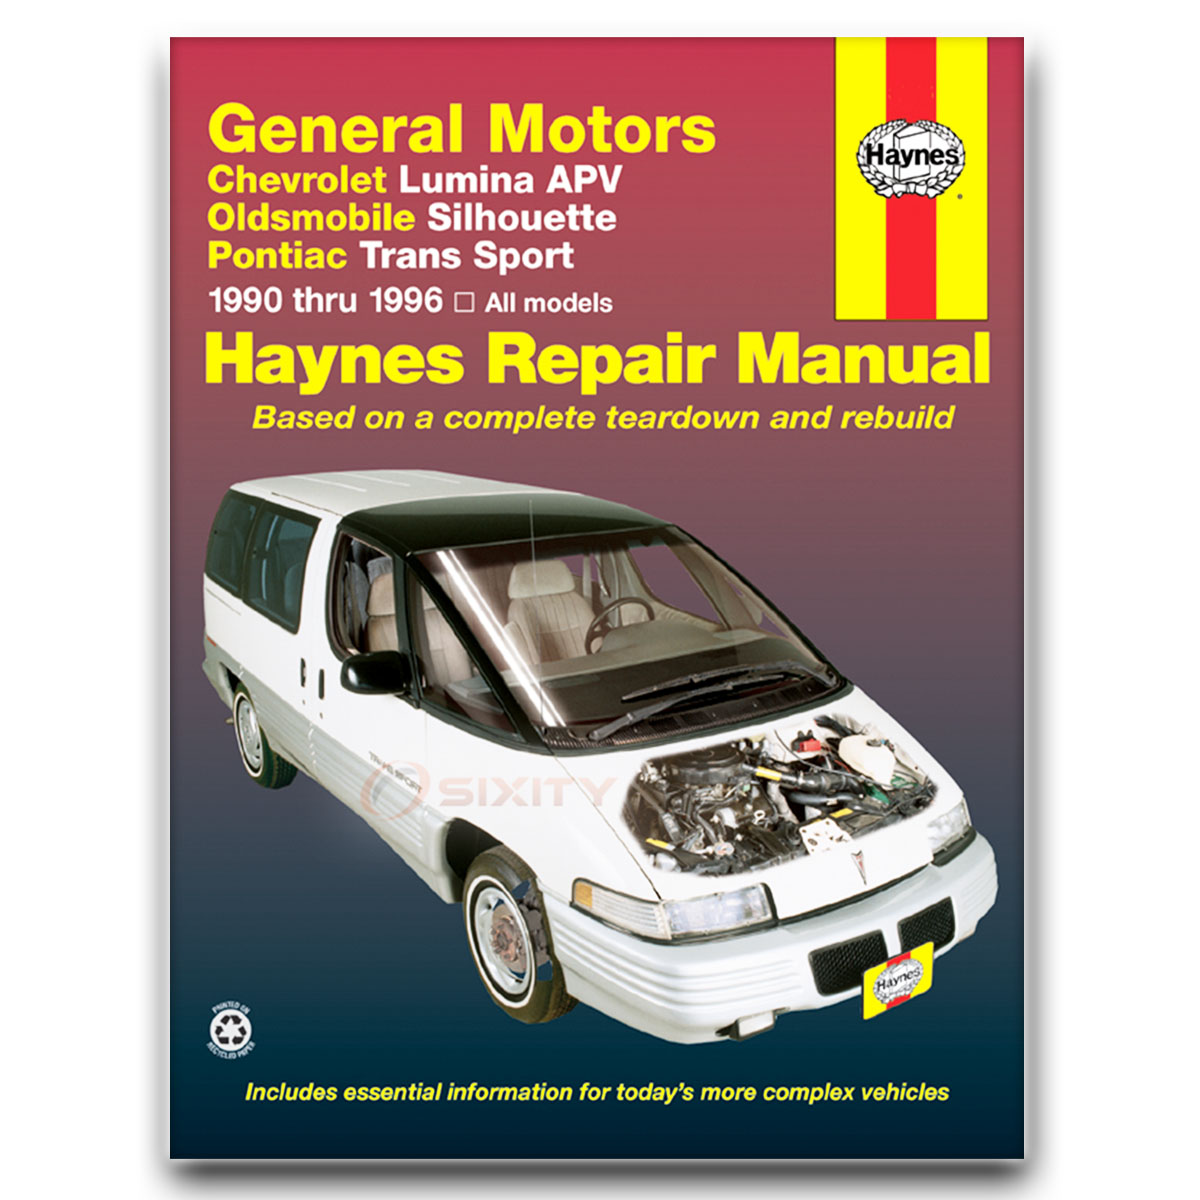 chevy lumina apv haynes repair manual ls base cl shop service garage rh ebay com 1996 chevy lumina repair manual free 1999 Chevy Lumina